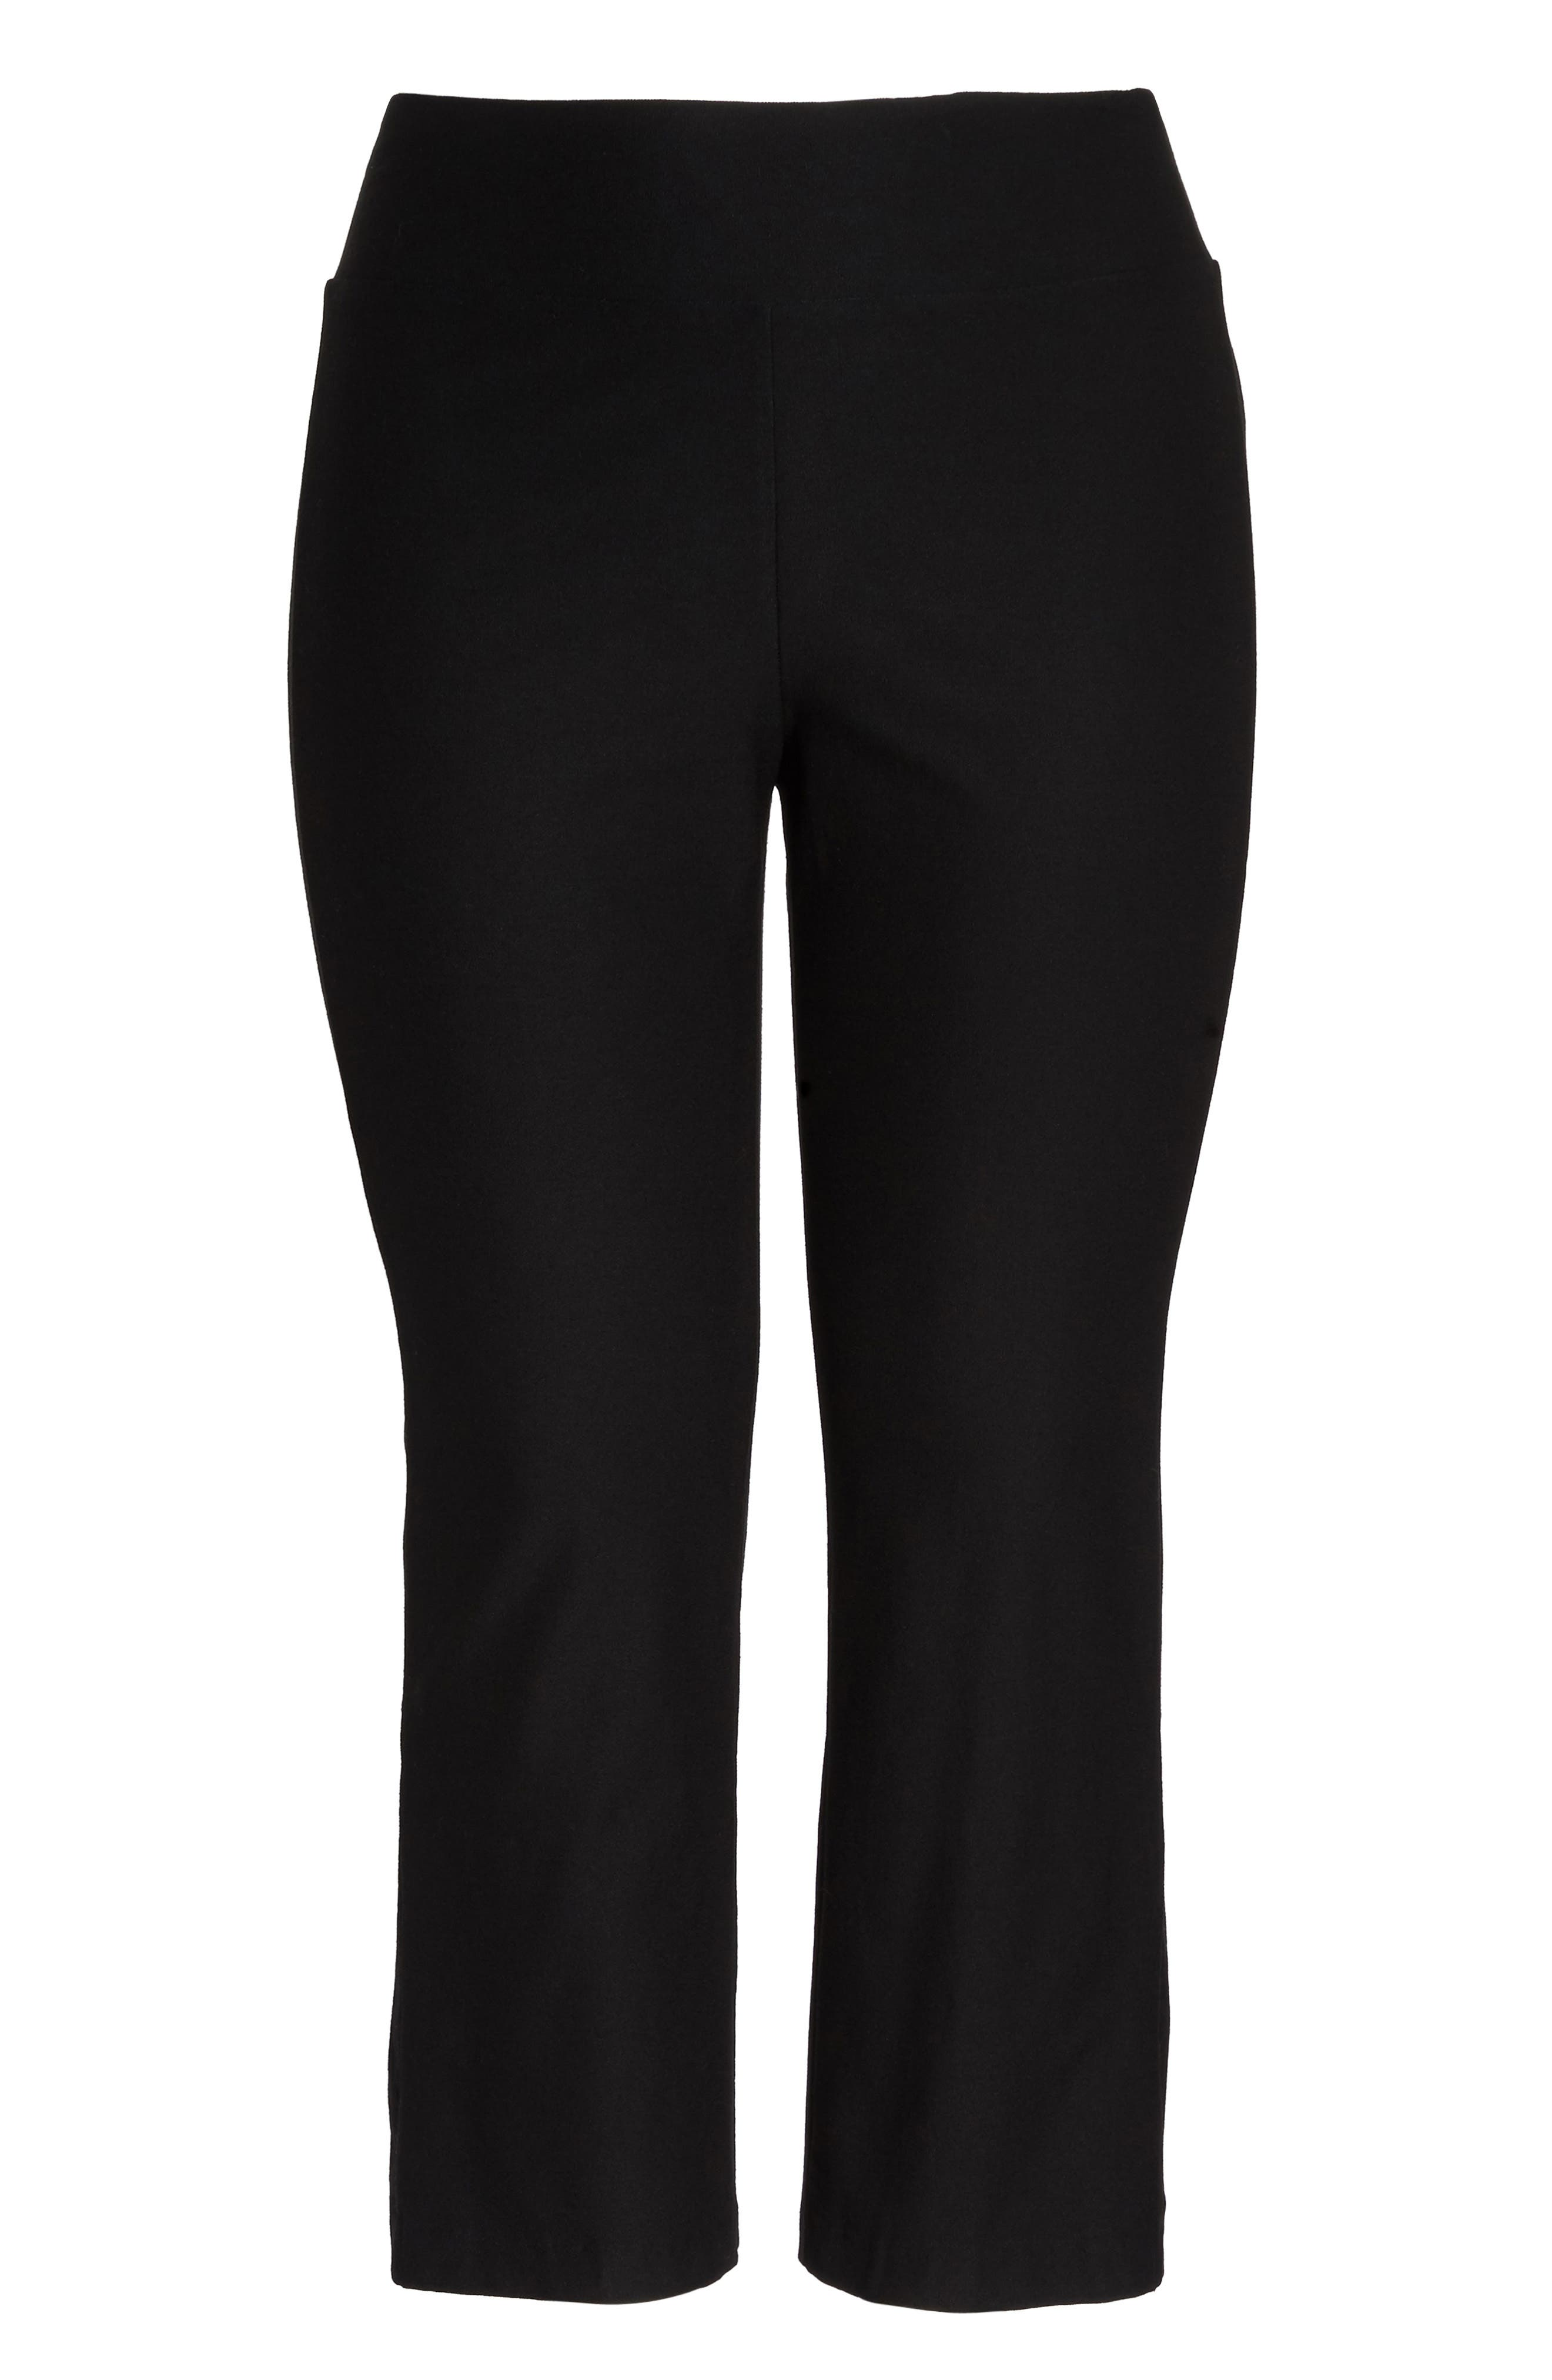 Stretch Bootcut Pants,                             Alternate thumbnail 6, color,                             001